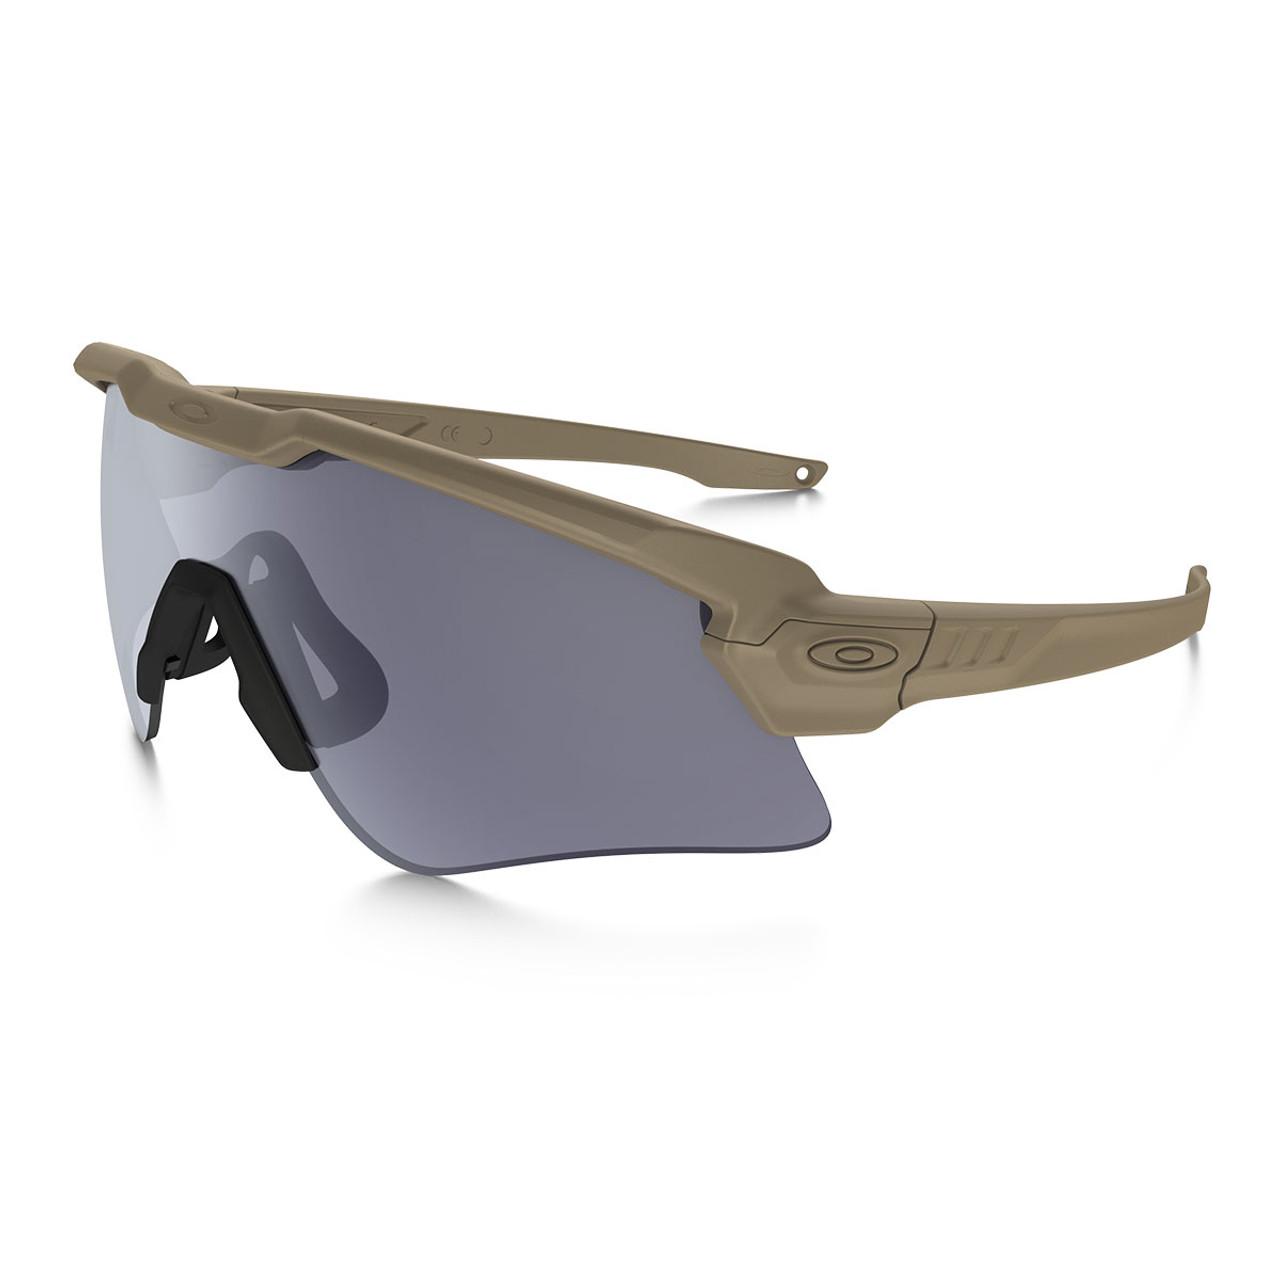 Oakley - SI Ballistic M Frame Alpha - Terrain Tan Frame w/ Grey Lens ...